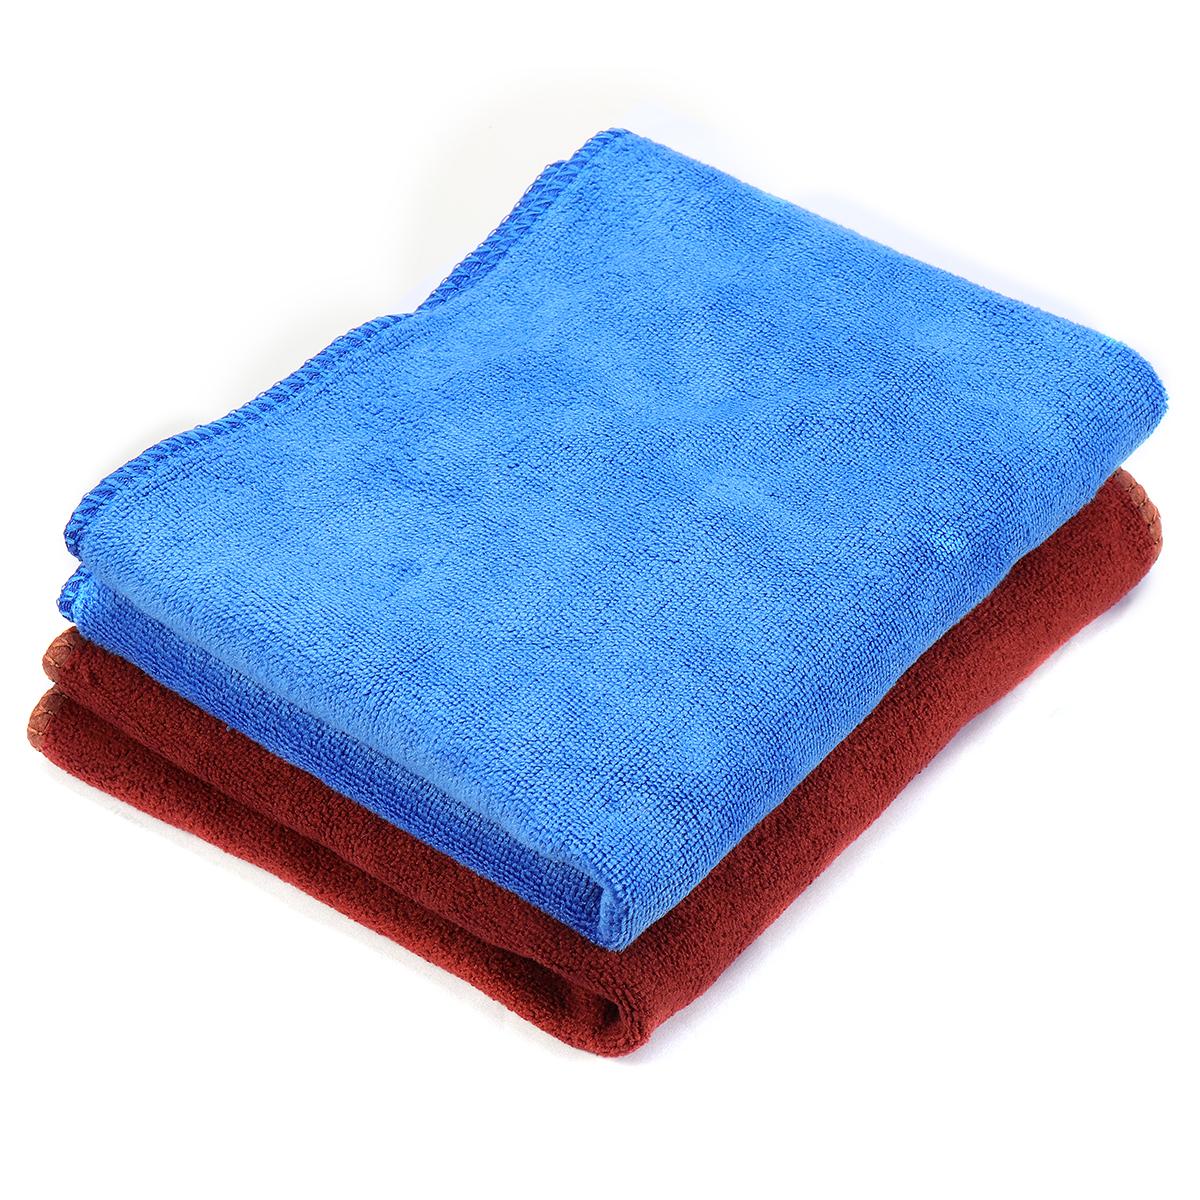 Microfiber Detailing Towels: Microfiber Cleaning Cloths No Scratch Rag Car Polishing